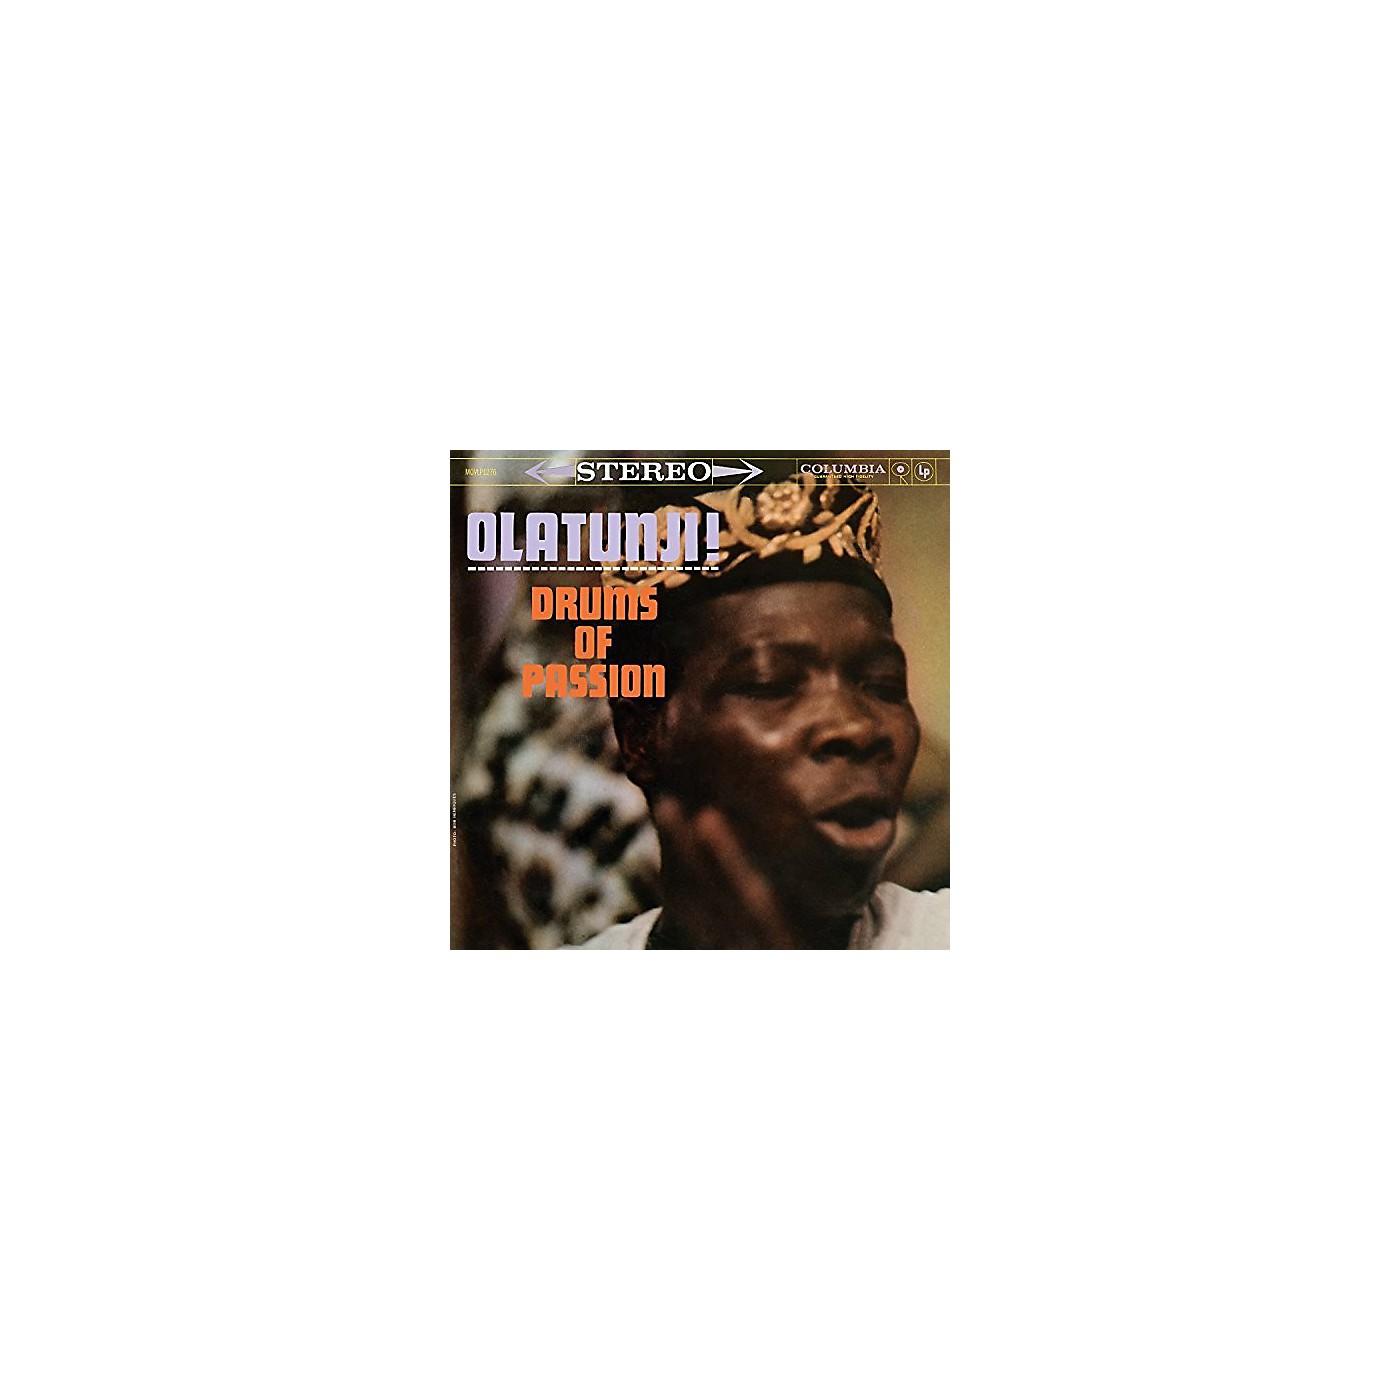 Alliance Olatunji - Drums Of Passion thumbnail